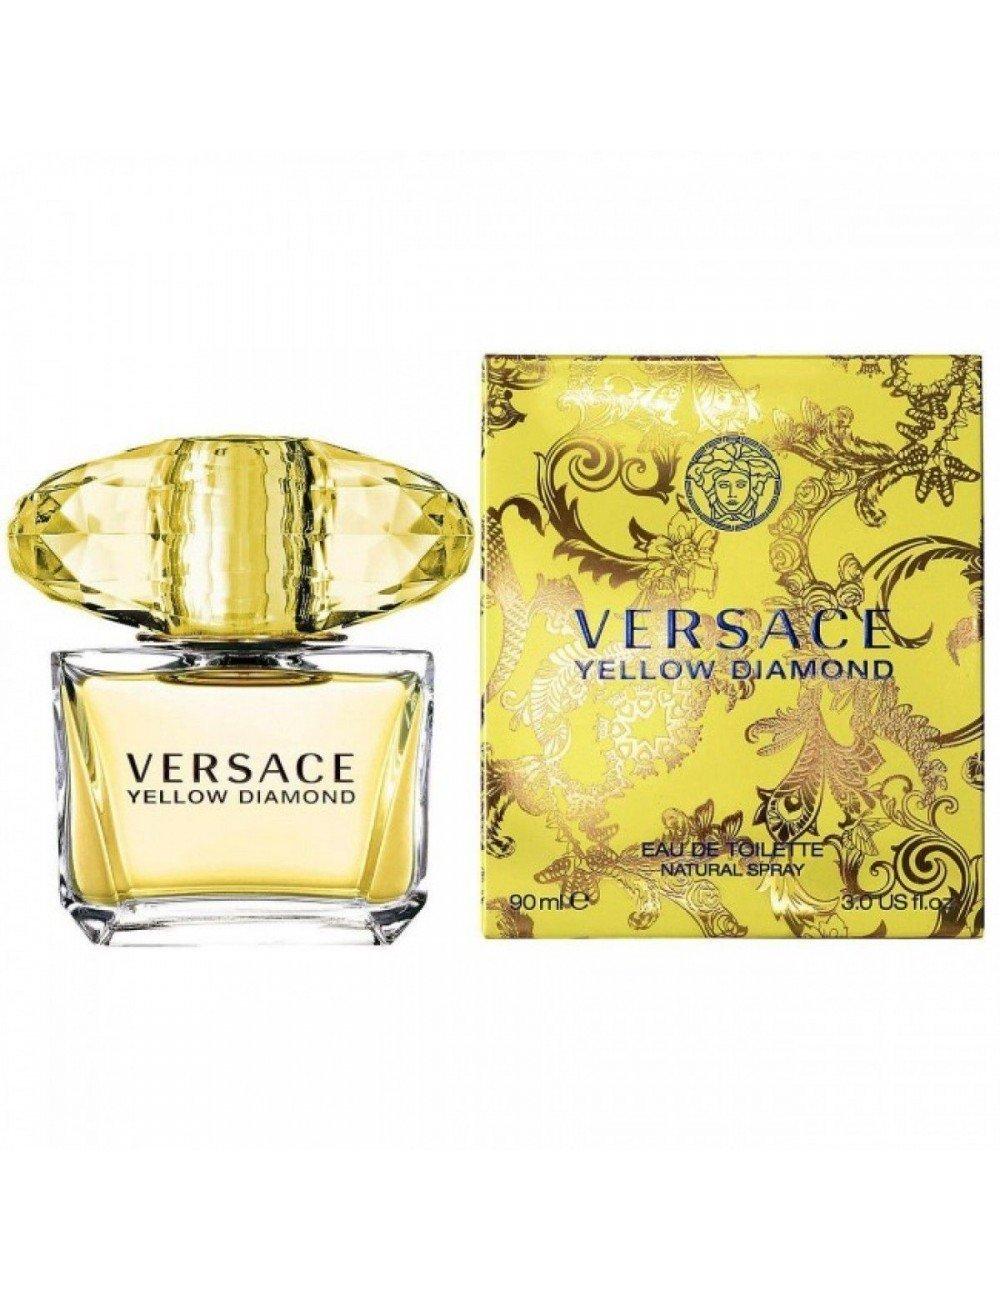 Ml Toilette Versace Eau De Yellow Diamond 90 cT3uK1lFJ5